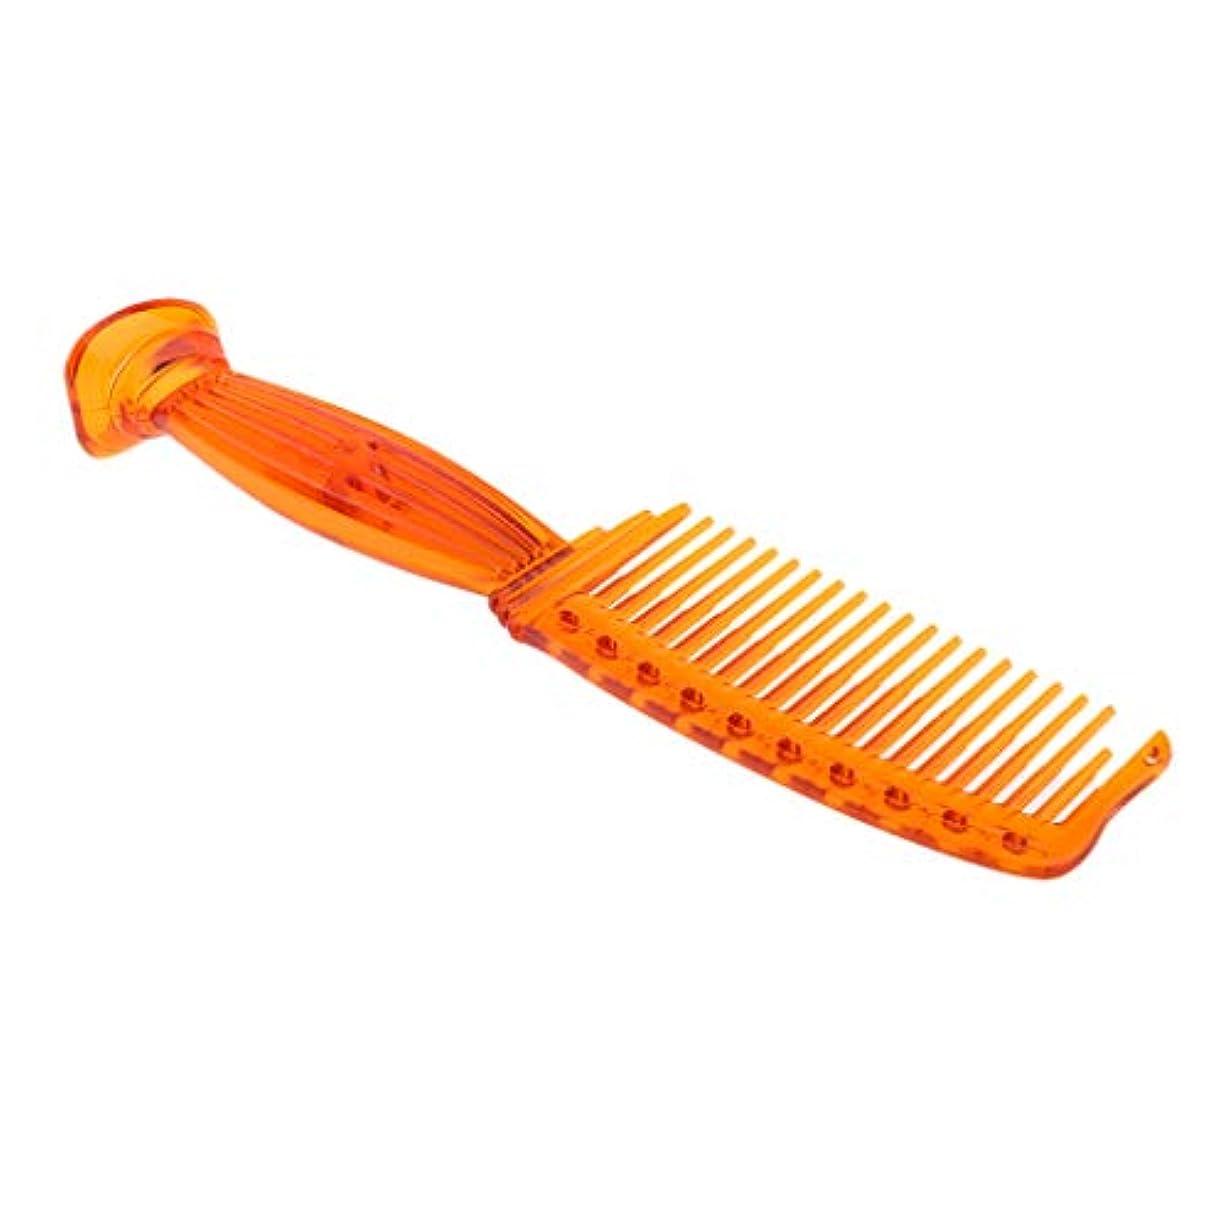 SM SunniMix ヘアコーム ヘアブラシ ワイド歯 プラスチック プロ ヘアサロン 理髪師 全5色選べ - オレンジ